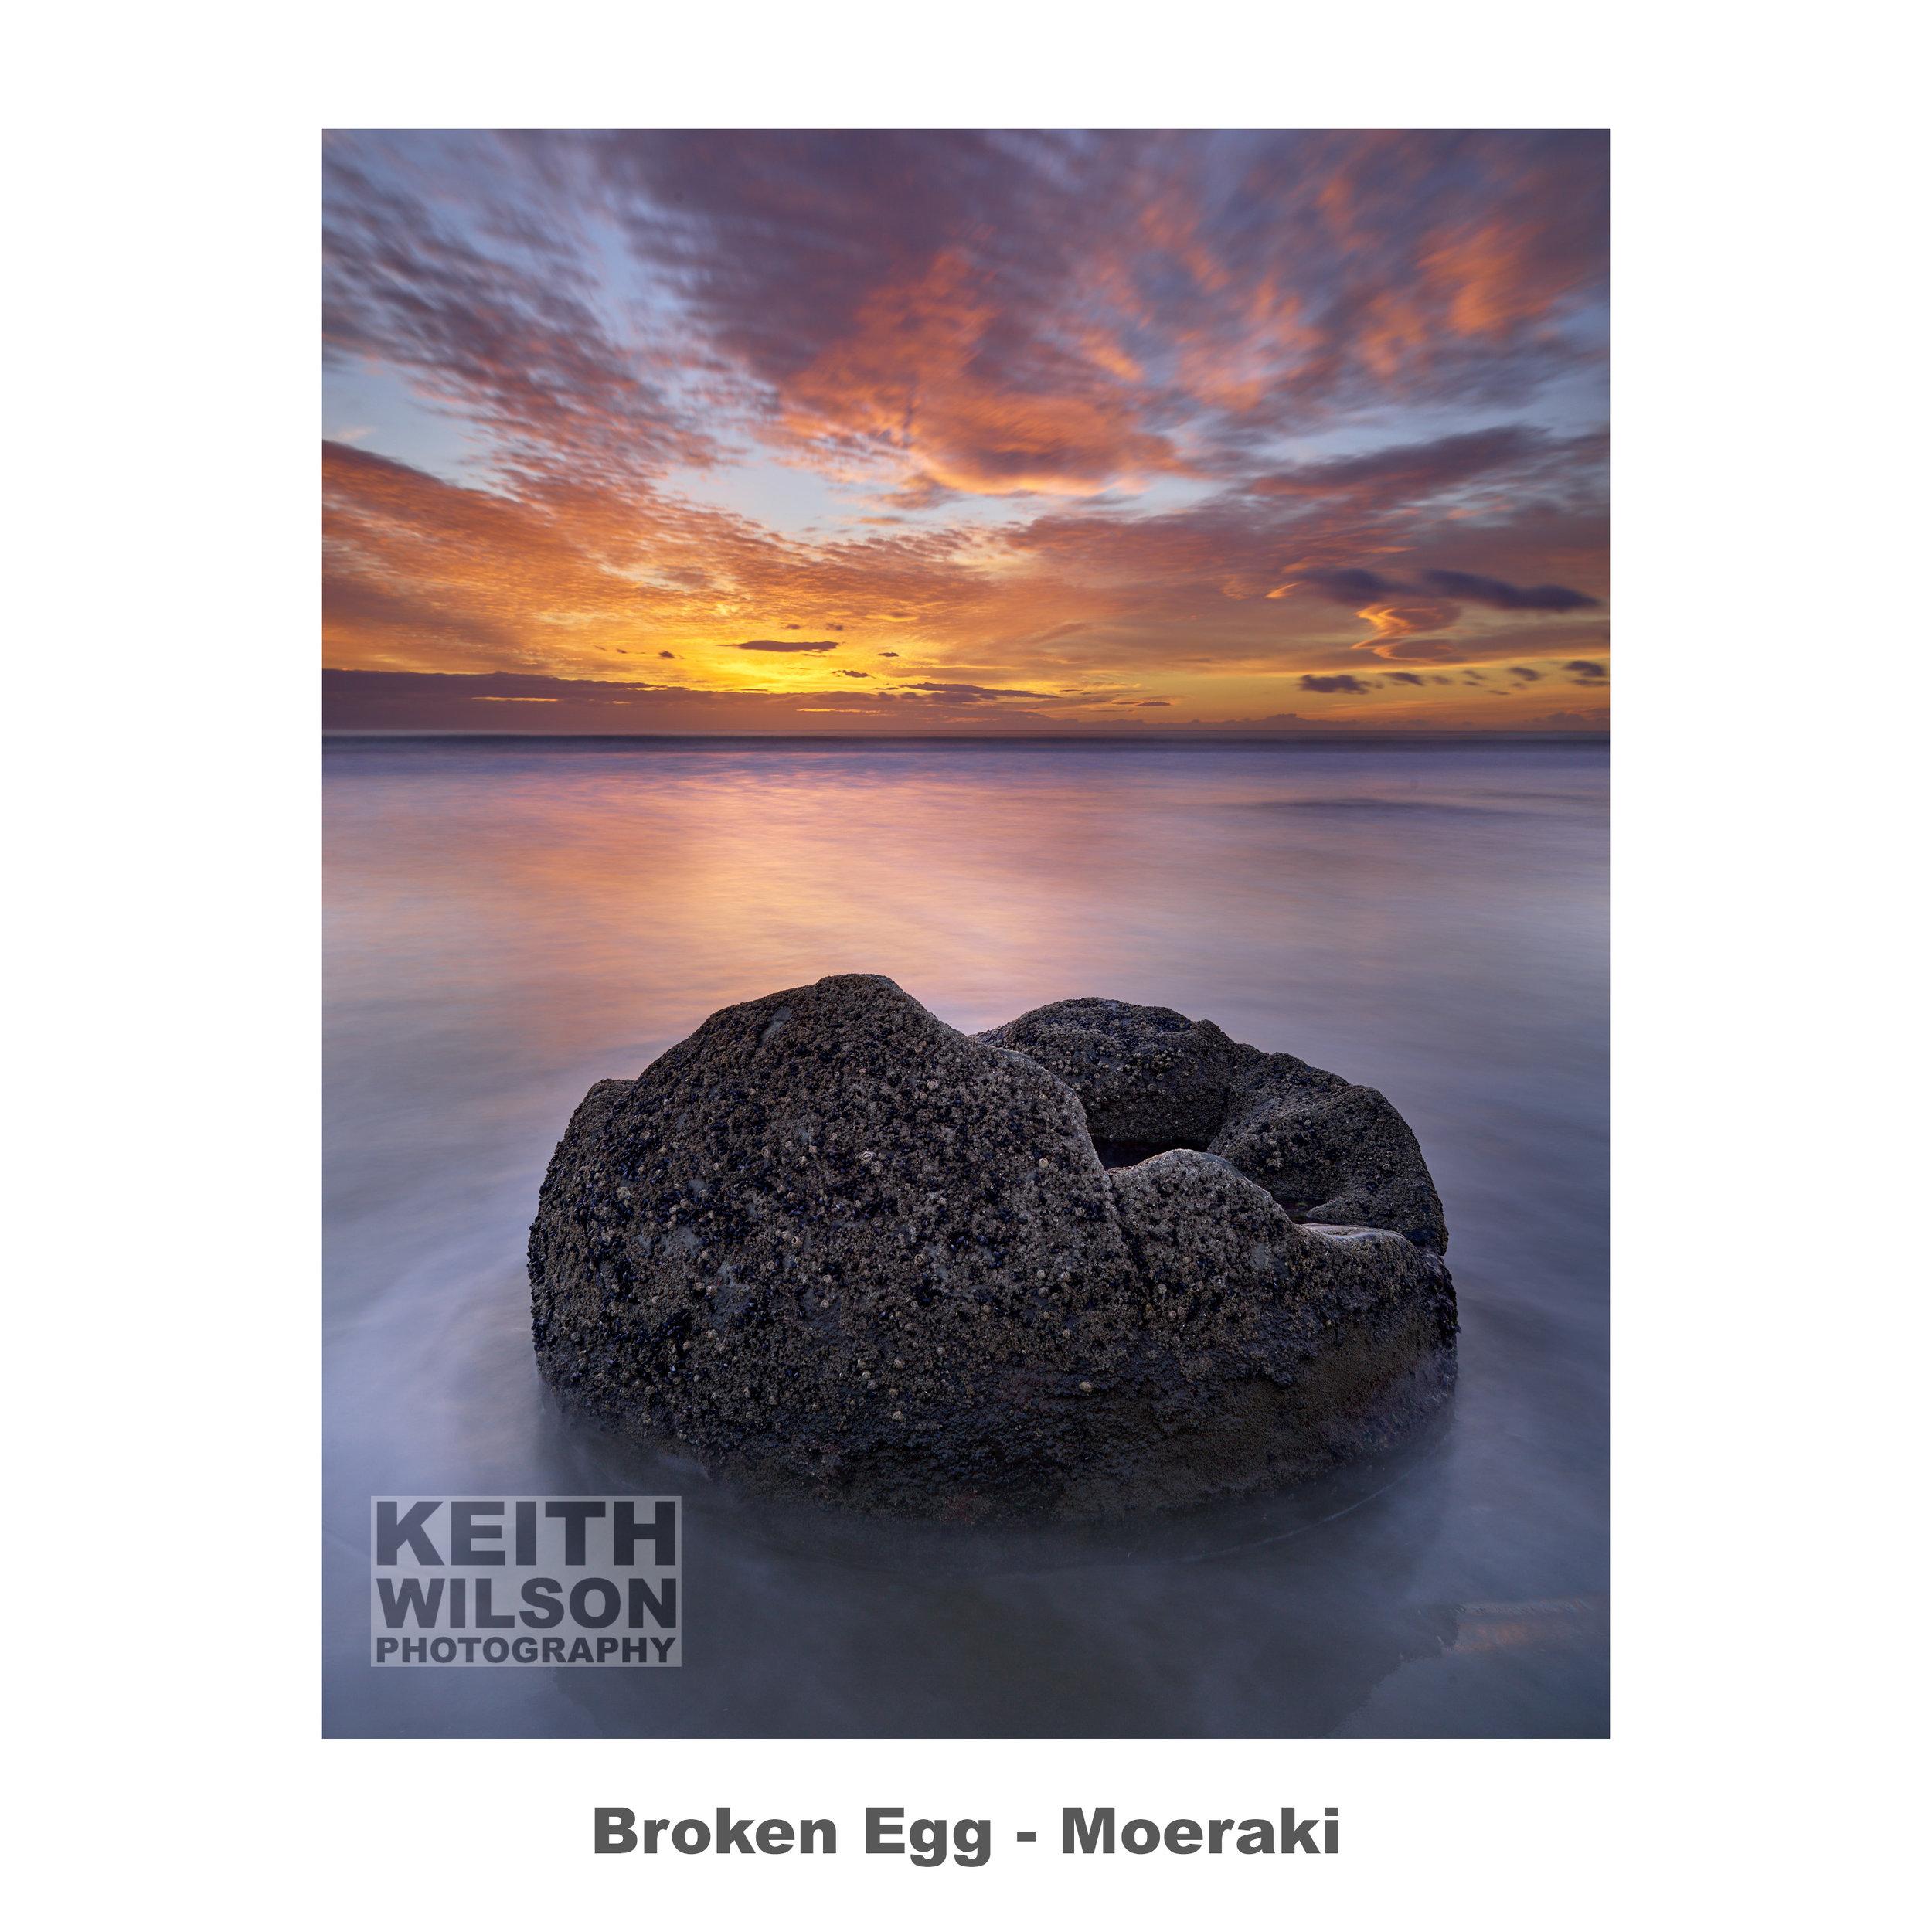 Broken Egg - Moeraki